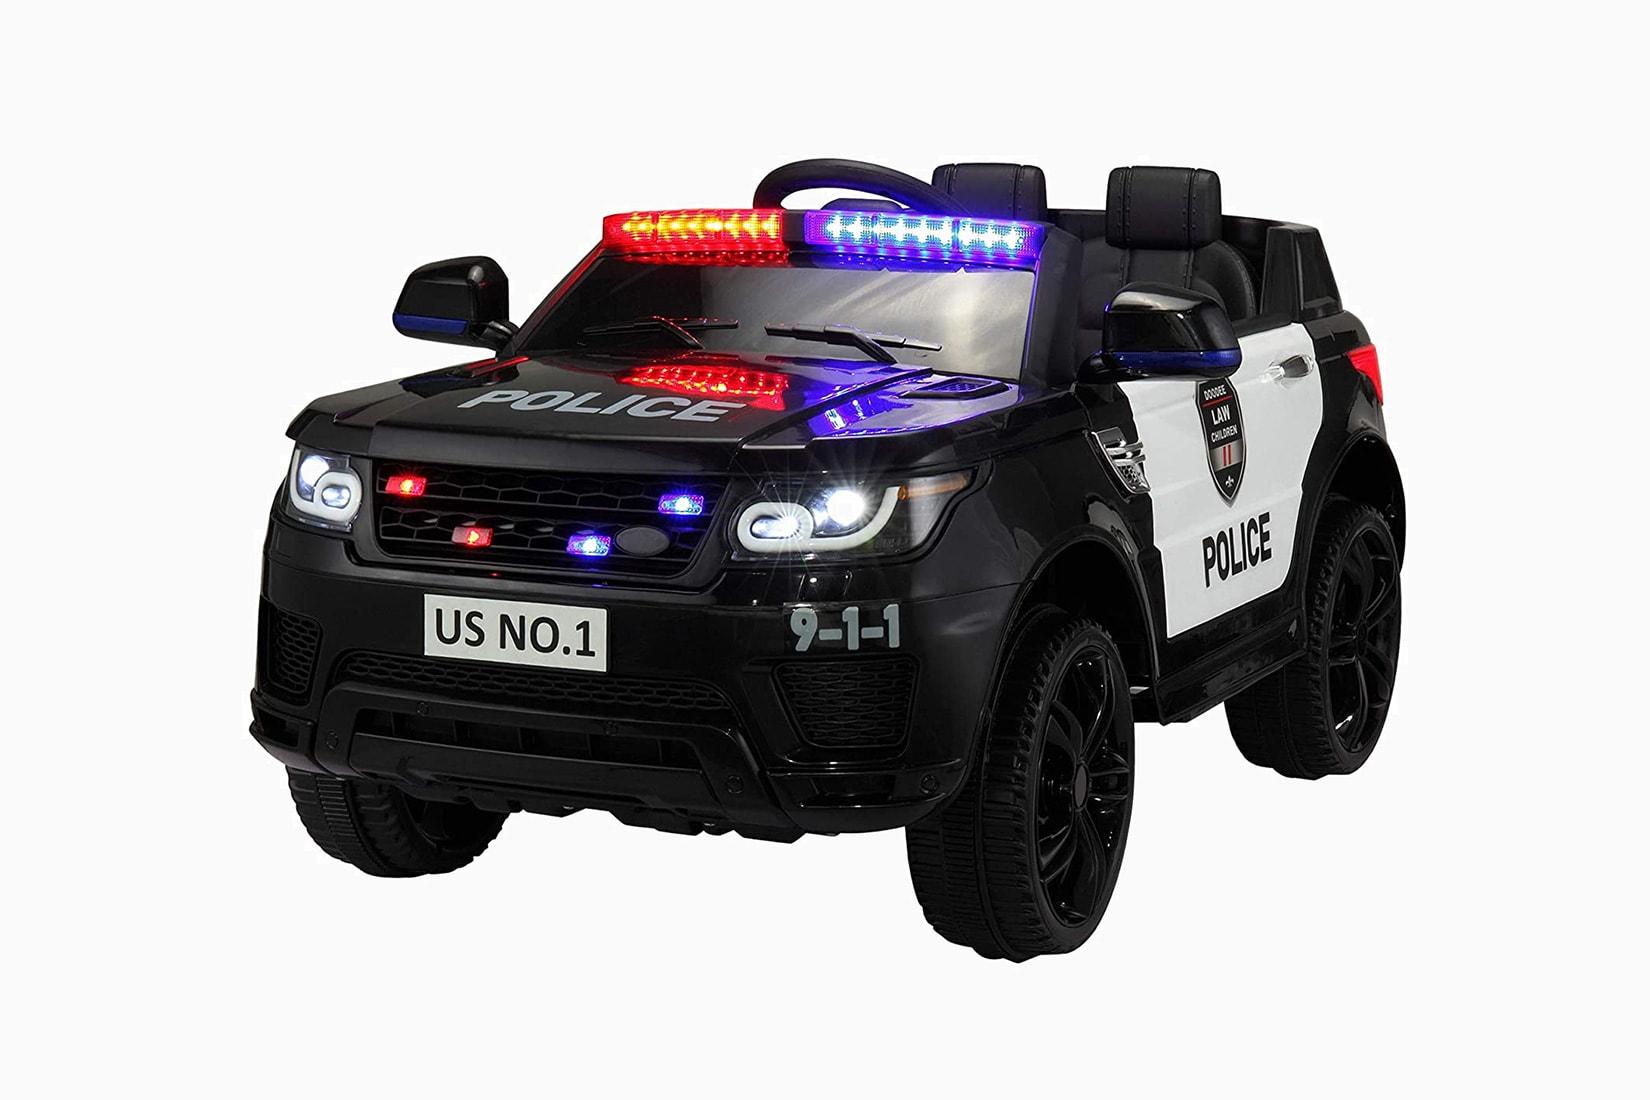 best electric cars kids tobbi police ride-on - Luxe Digital